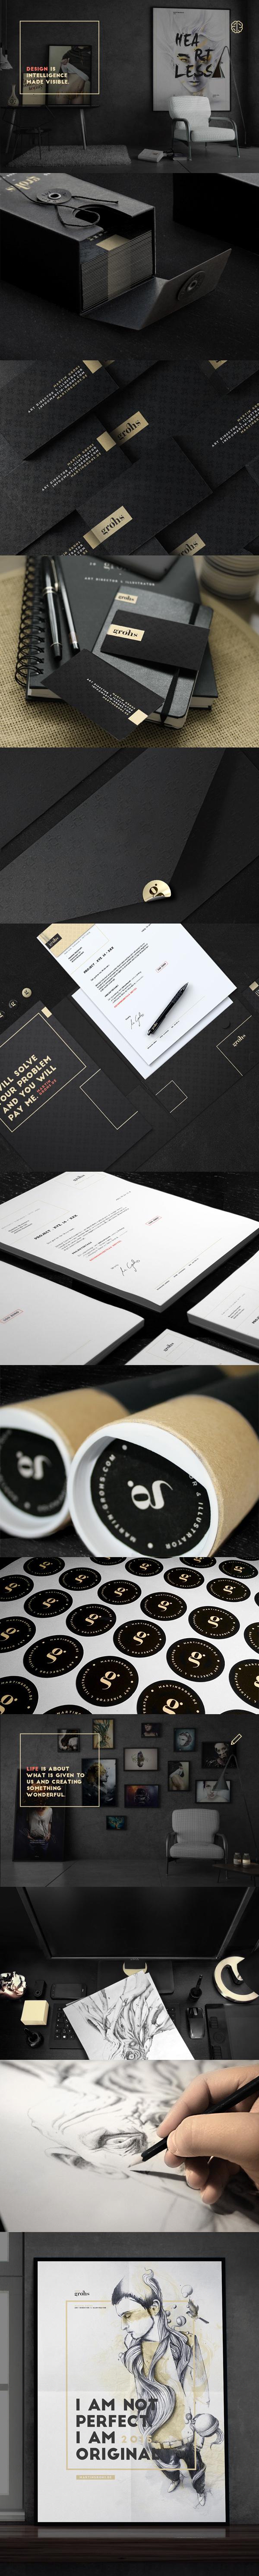 Unique branding design. Martin Grohs. Design is intelligence made visible.